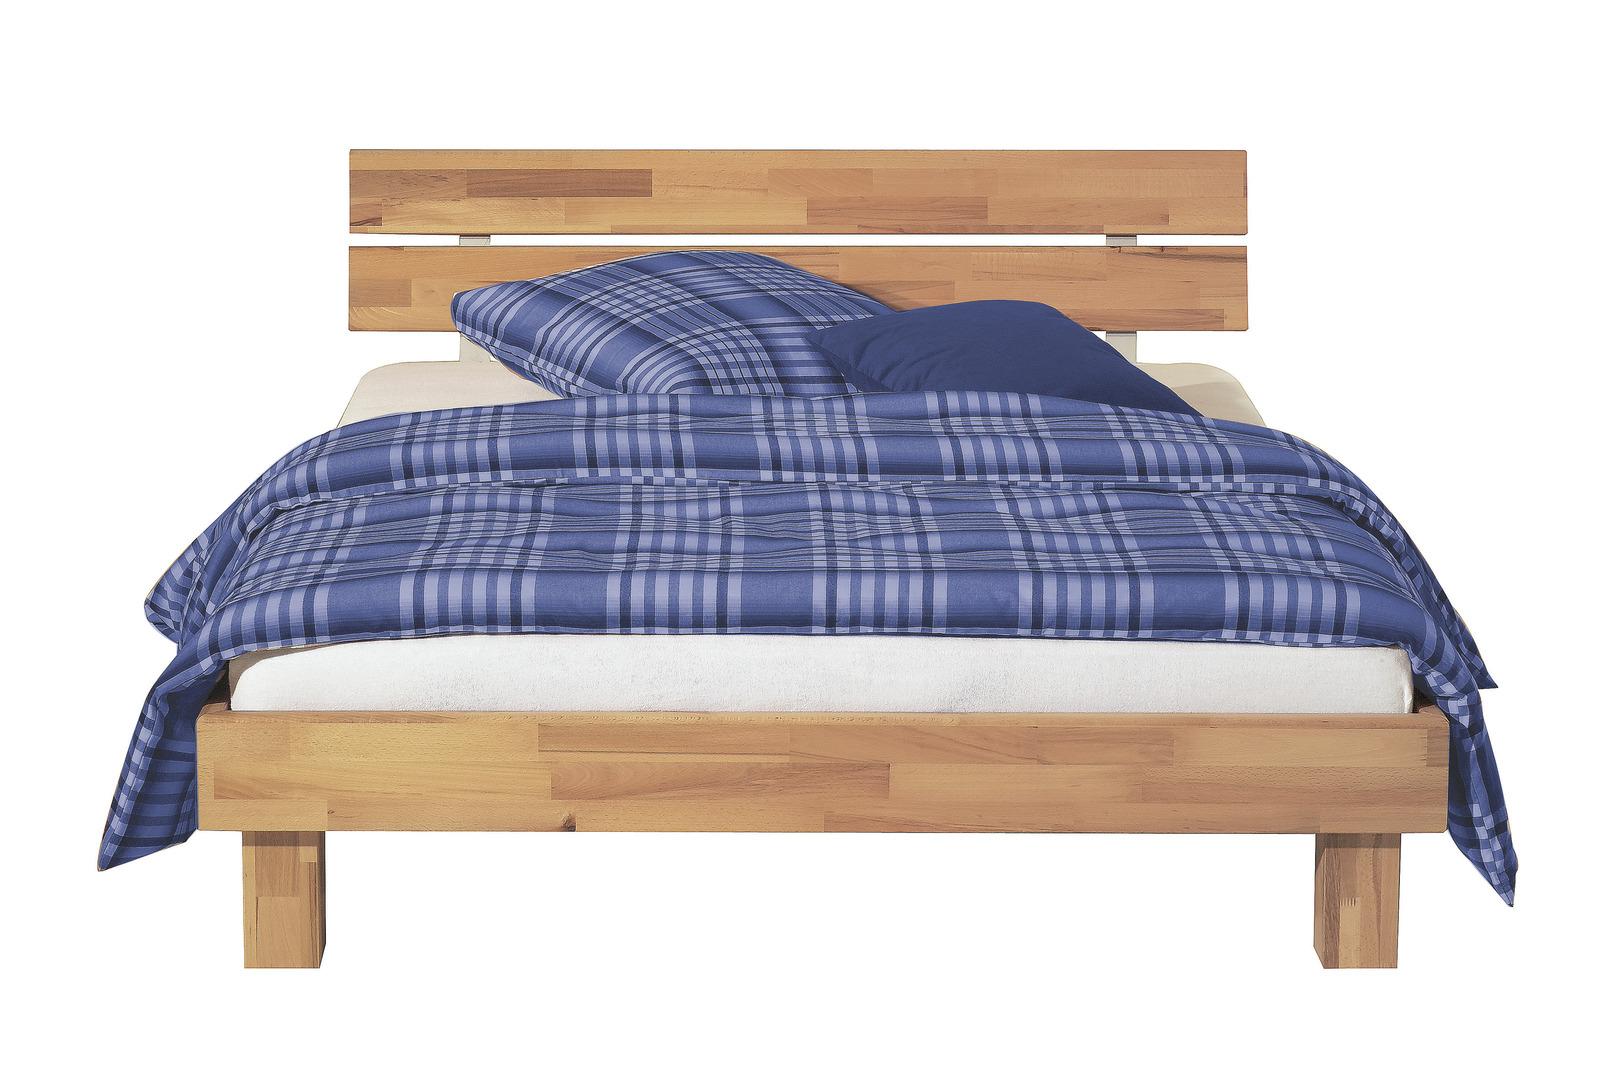 Massivholz-Bettgestell, ein Futonbett mit Komfort